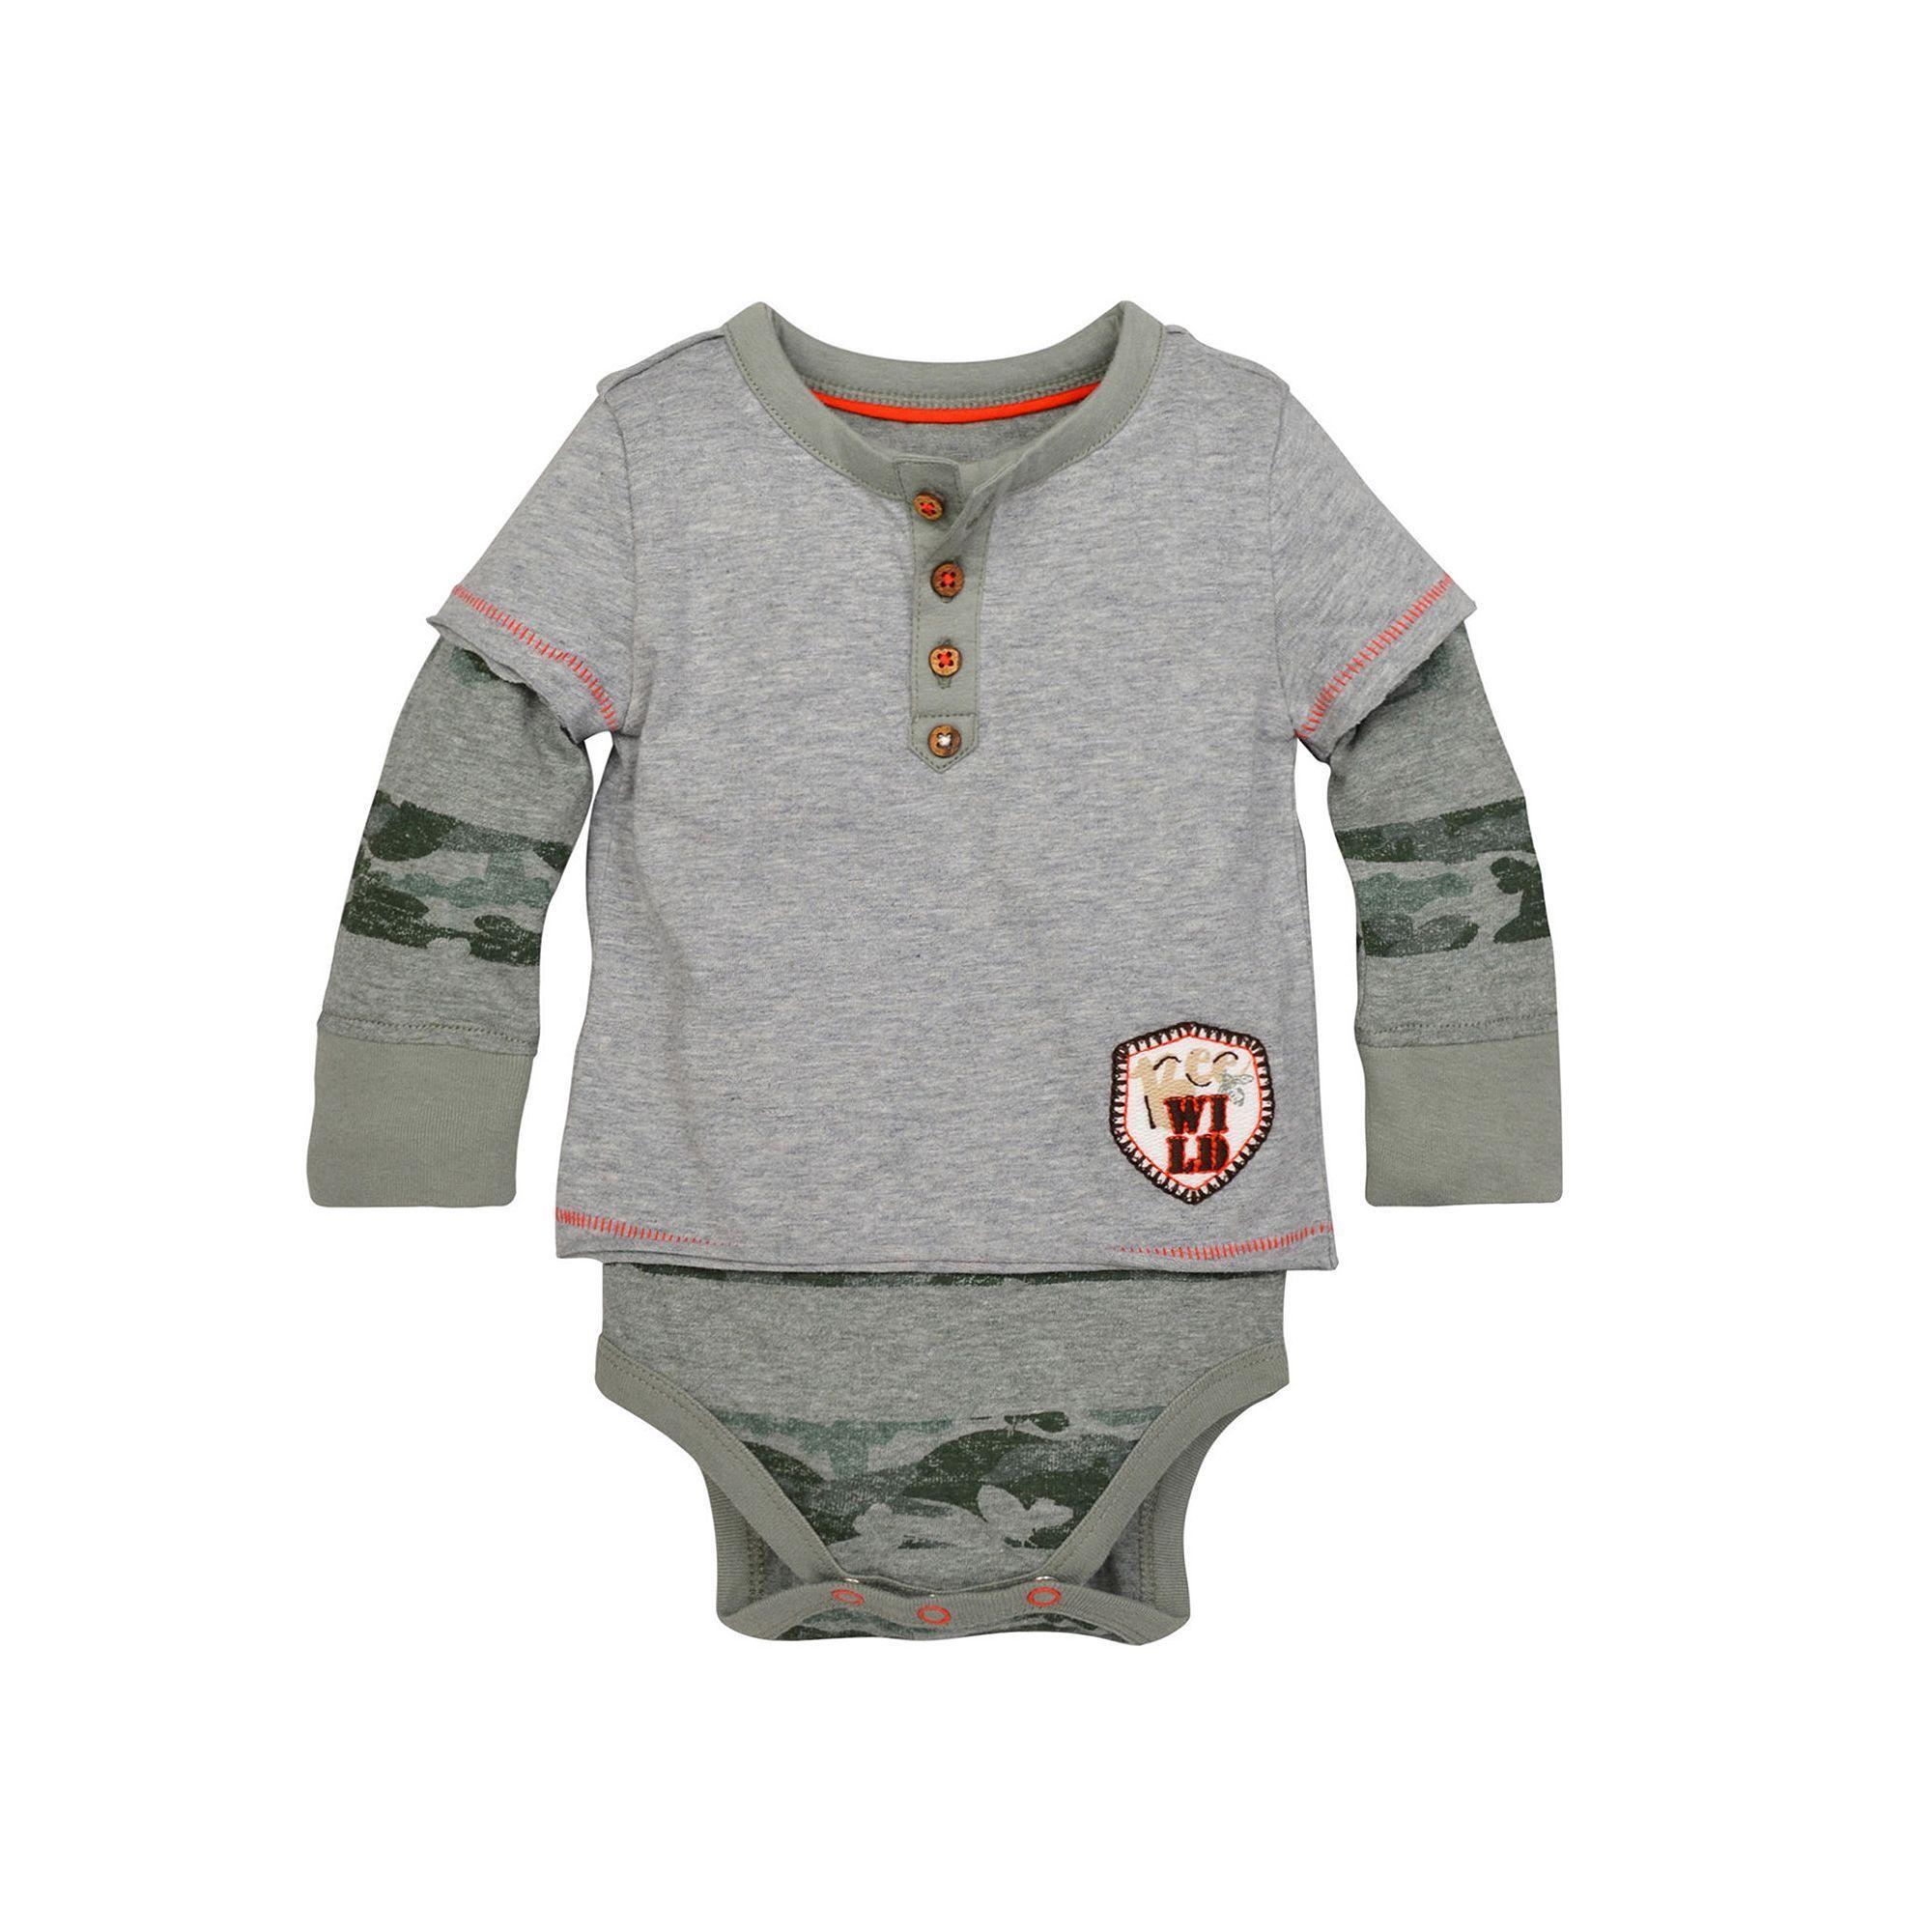 712e1e1d3a0c Baby Boy Burt s Bees Baby Organic 2-in-1 Henley Mock-Layer Tee   Bodysuit  Set